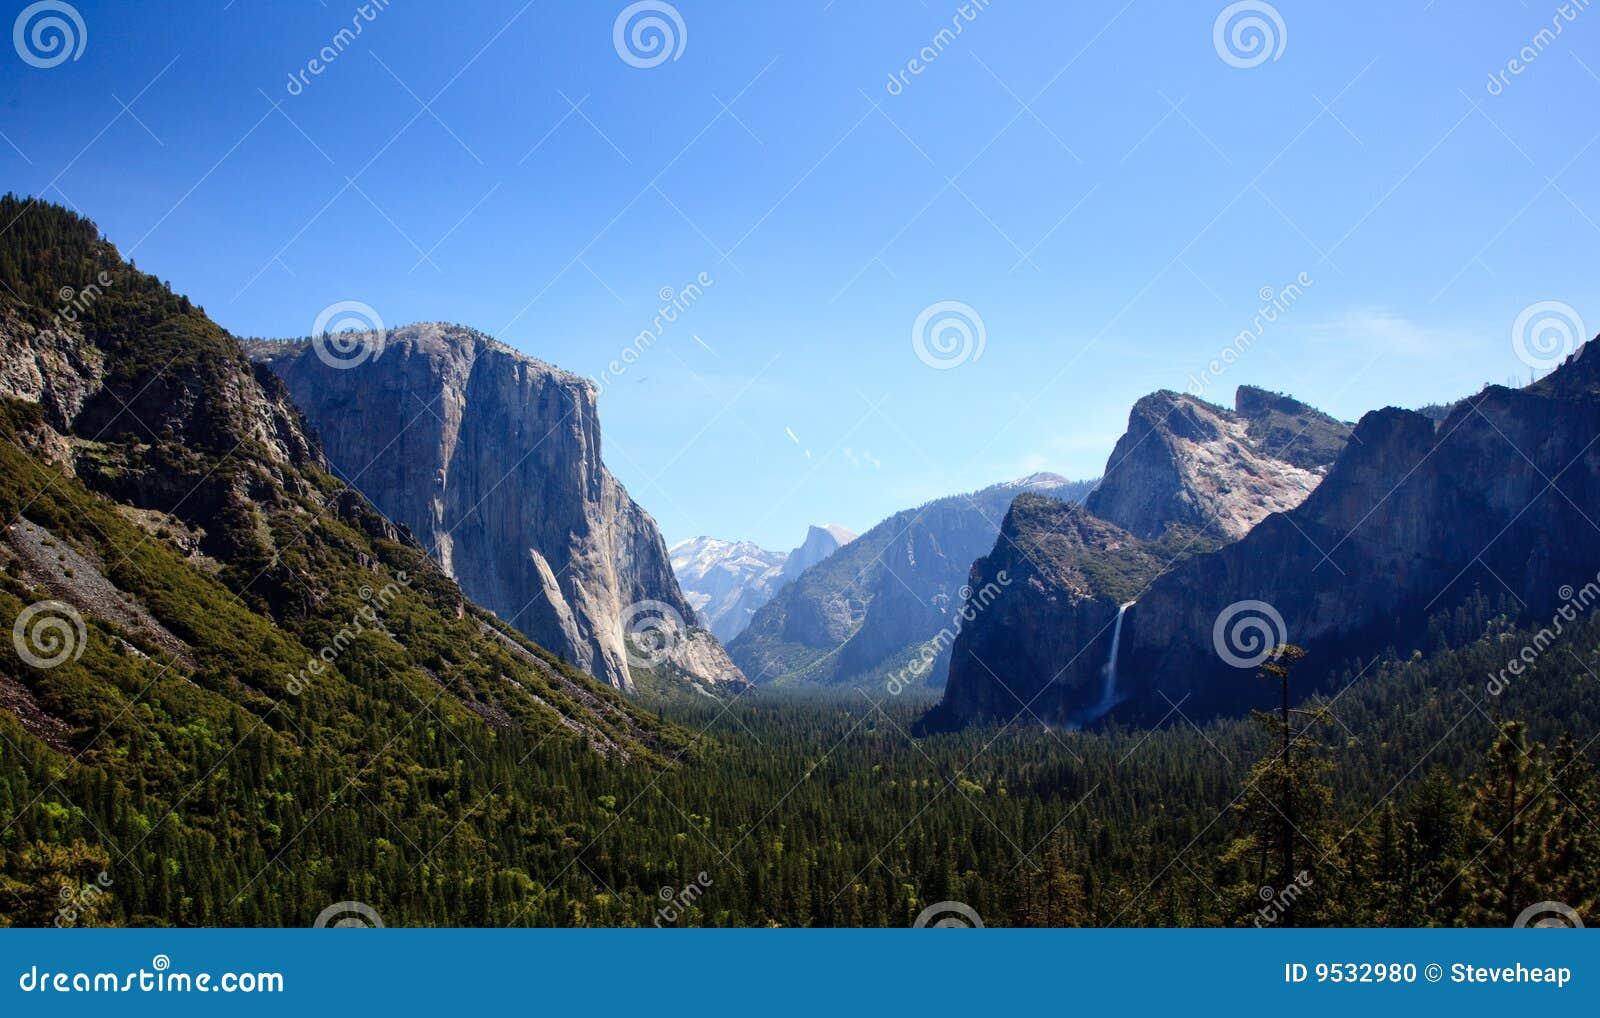 Yosemite Valley with waterfalls